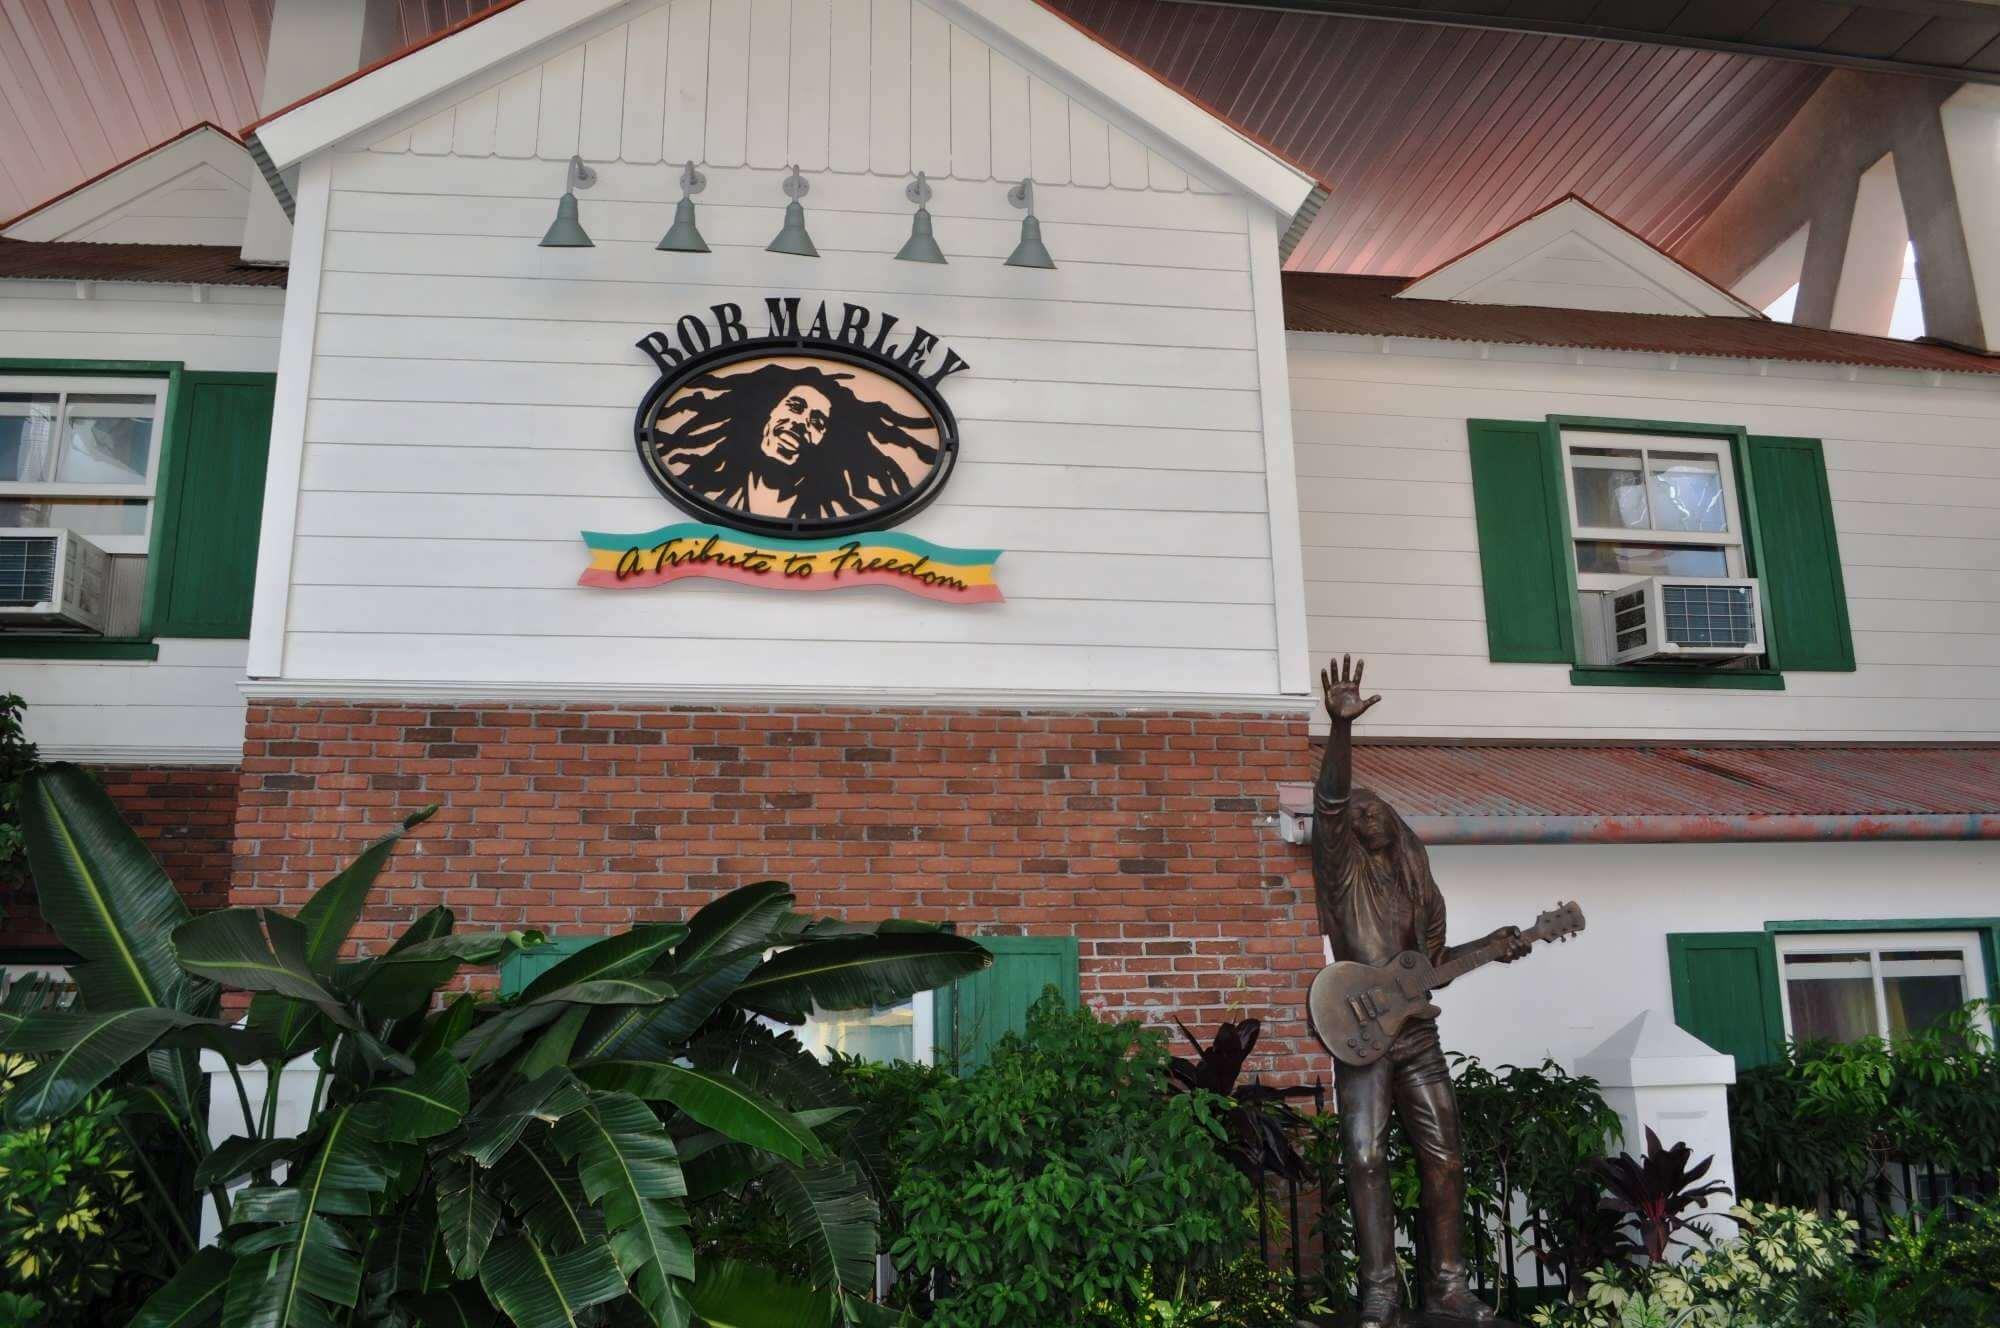 CityWalk Universal em Orlando: Bob Marley - A Tribute to Freedom